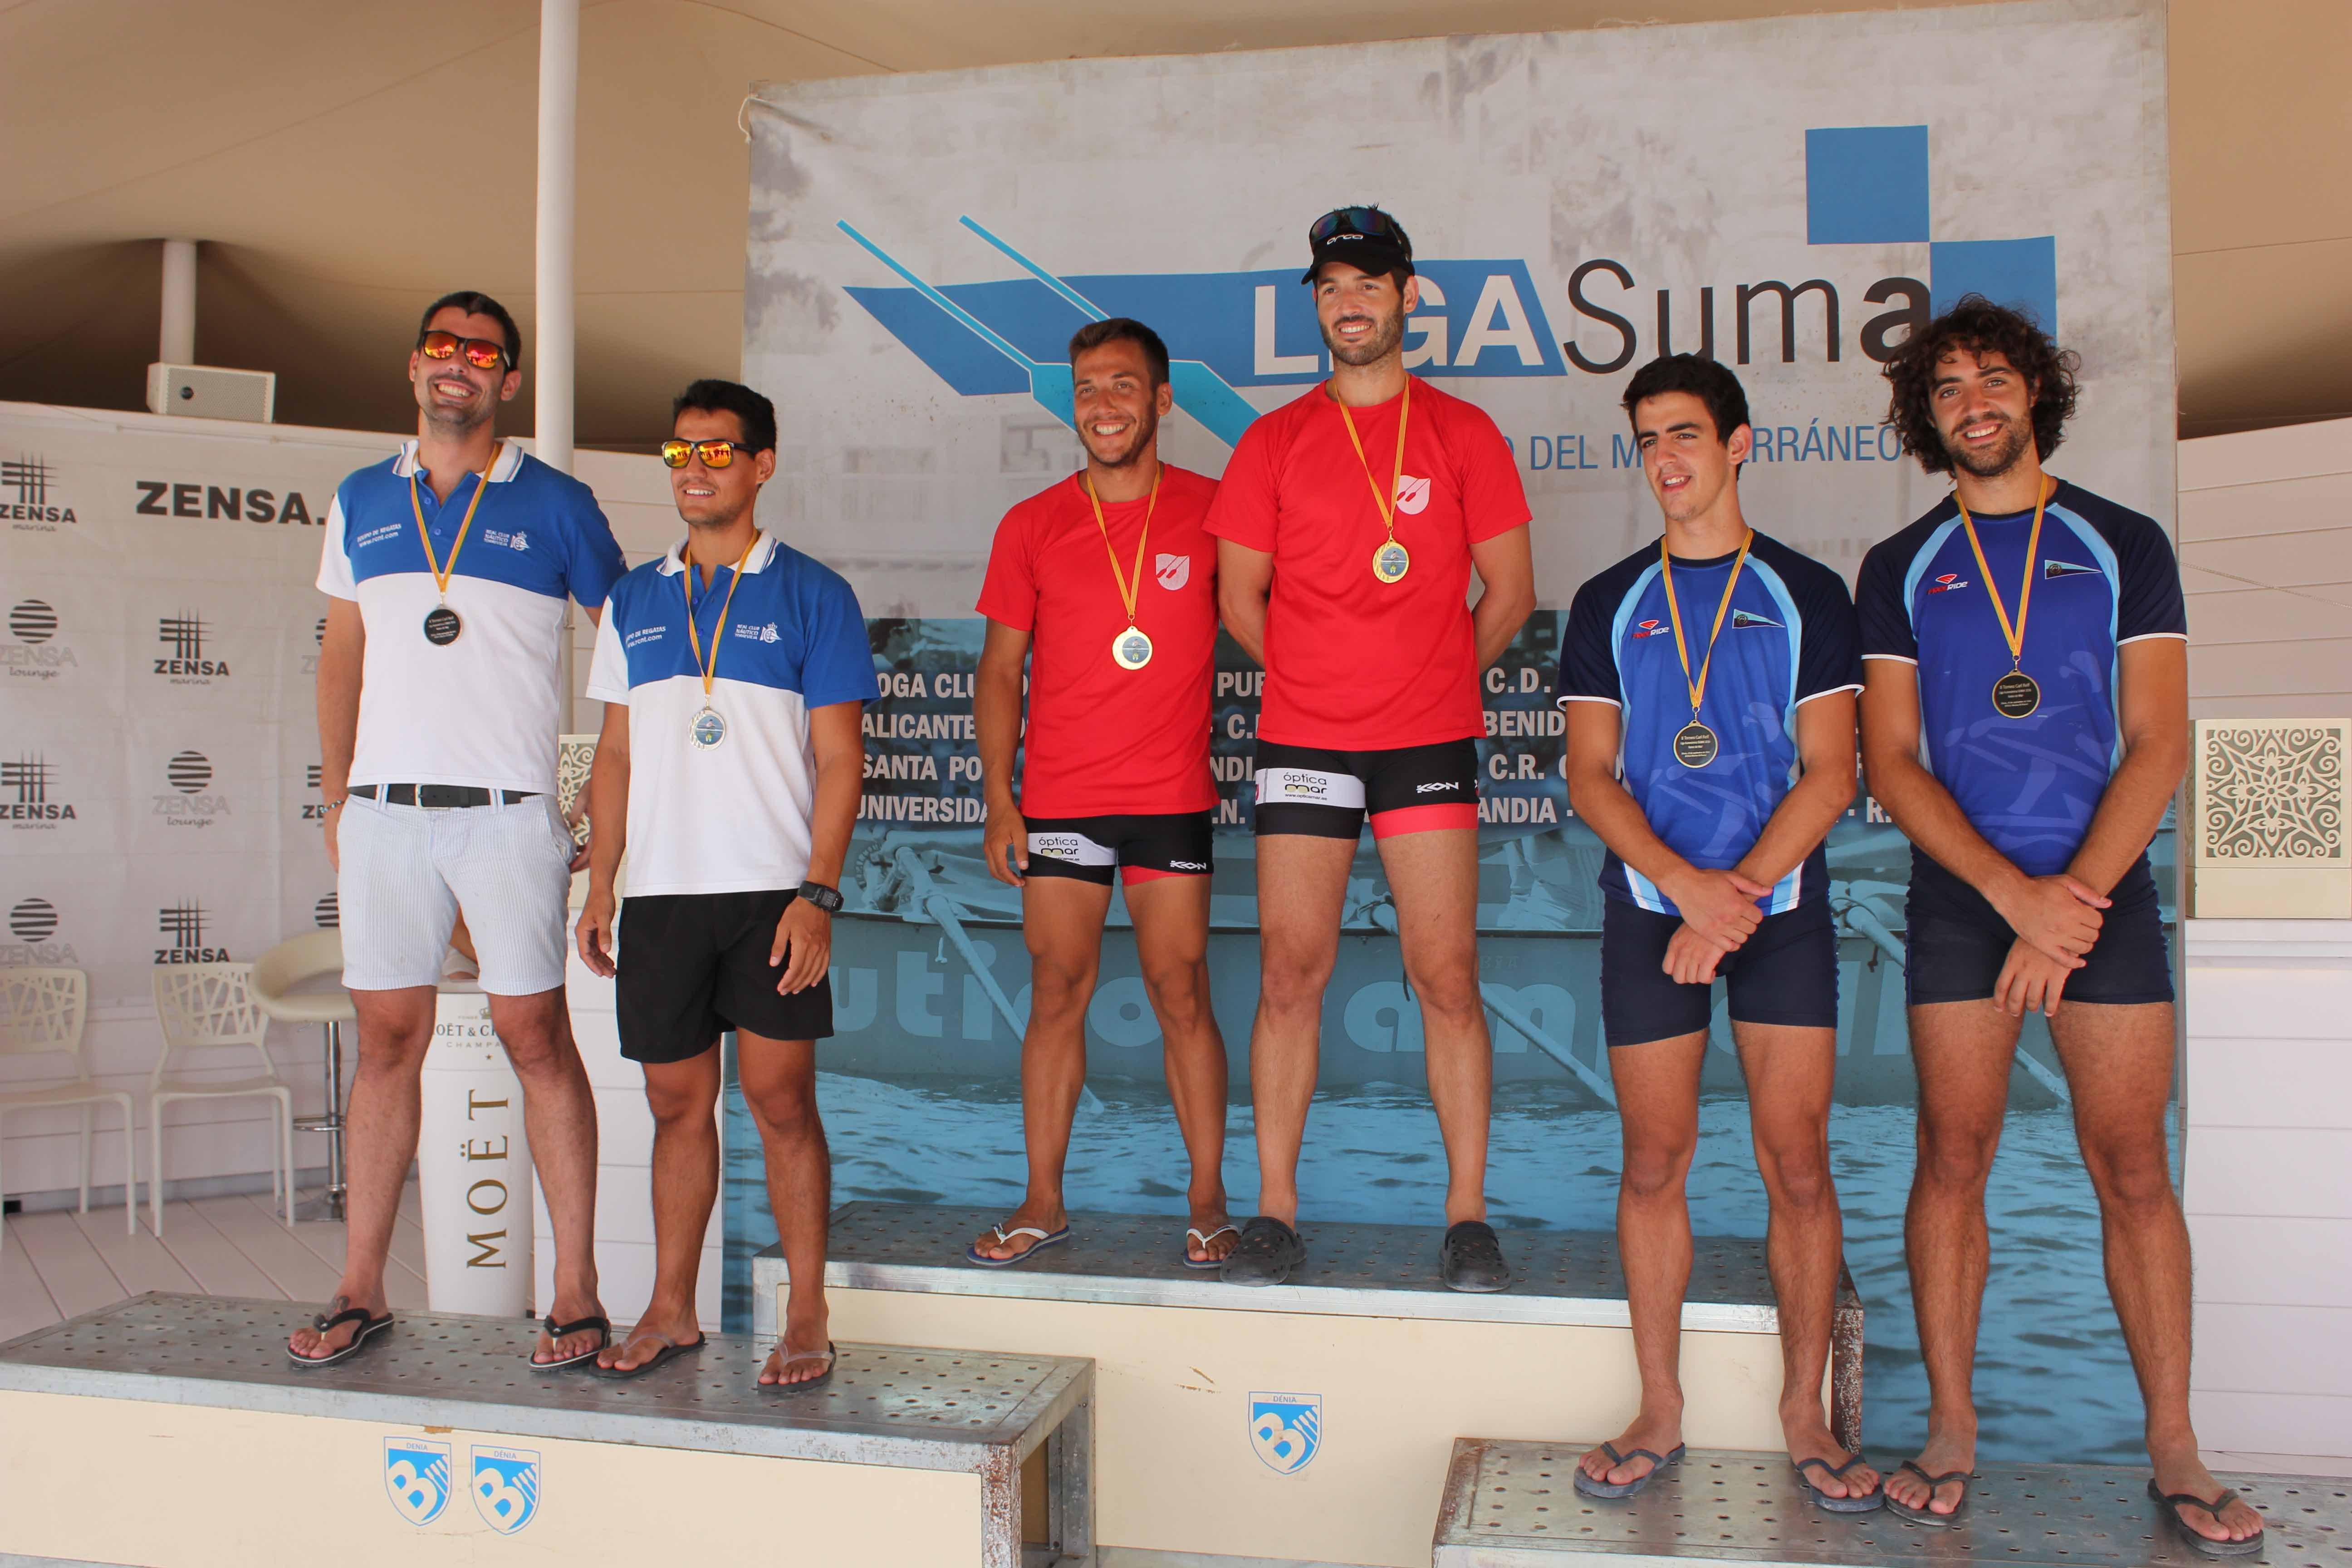 podium-doble-absoluto-masculino